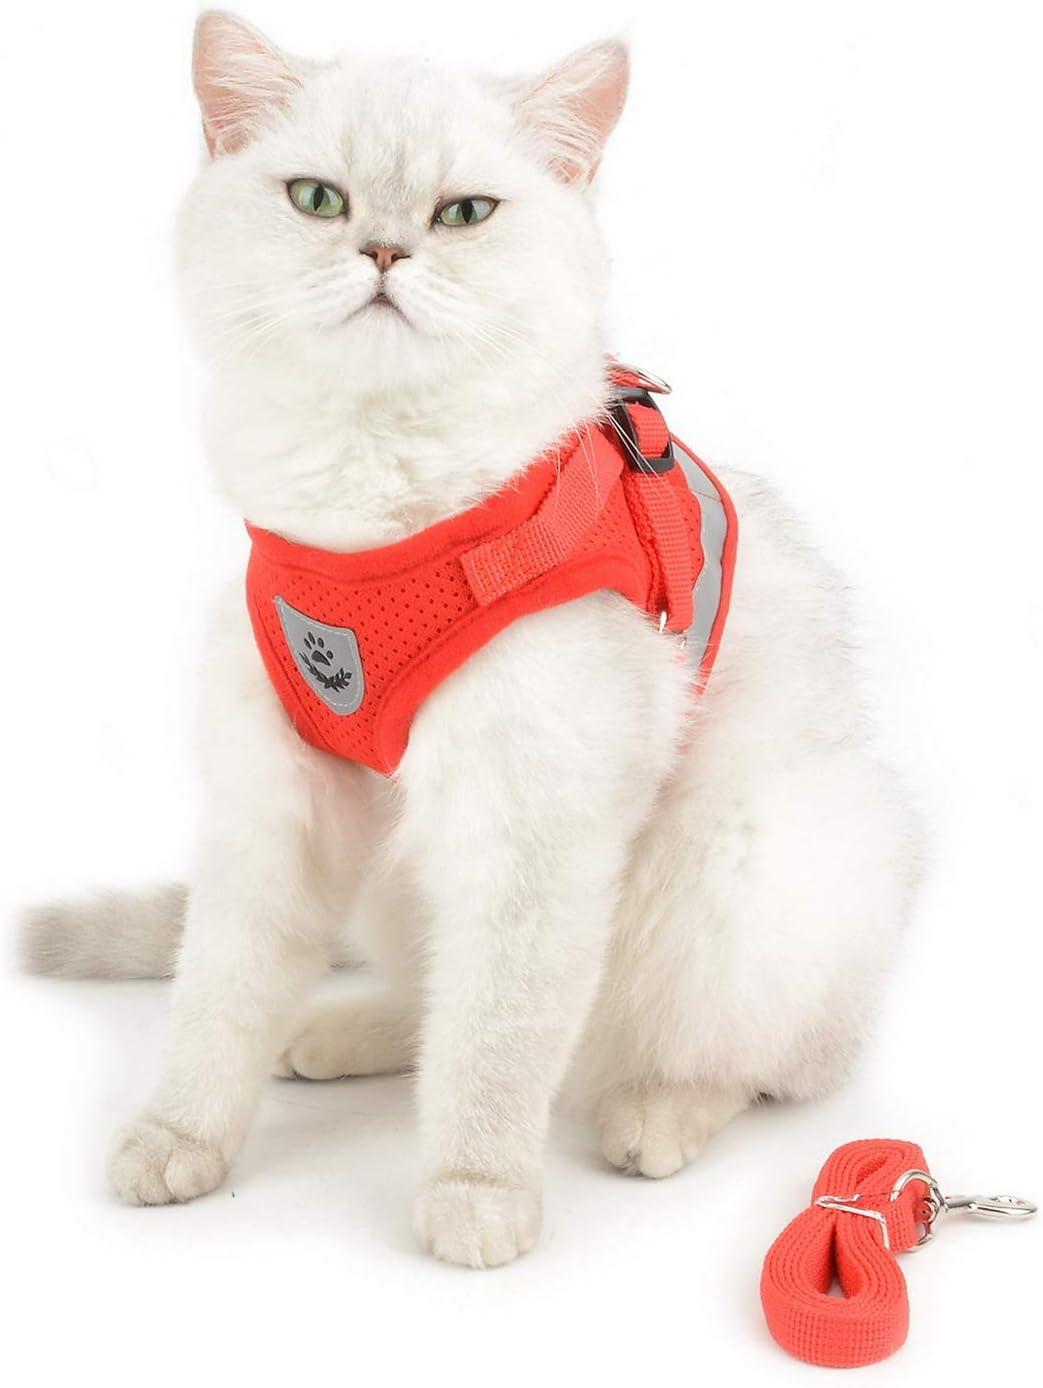 Smalllee Lucky Gilet Doux en Nylon pour Animal Domestique de Taille Petite ou Moyenne Rouge S